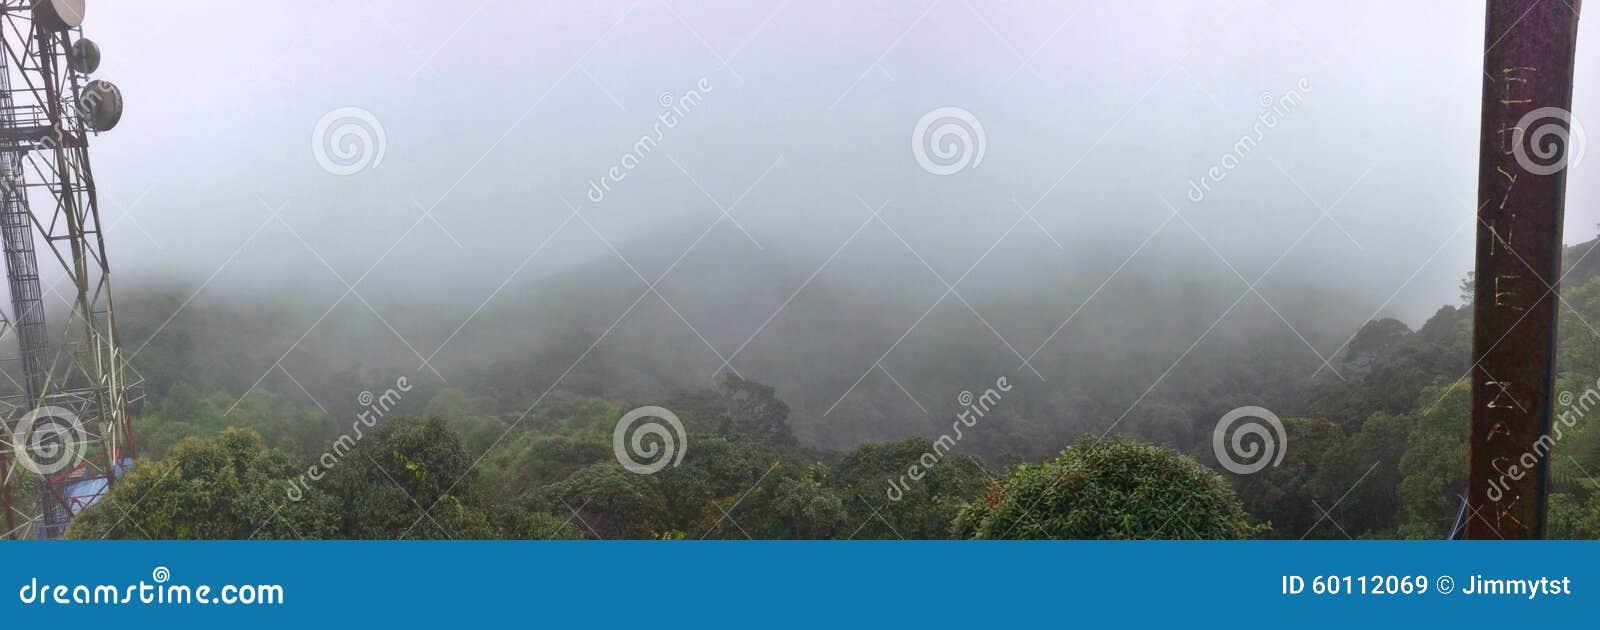 Opinião da cimeira - Gunung Brinchang